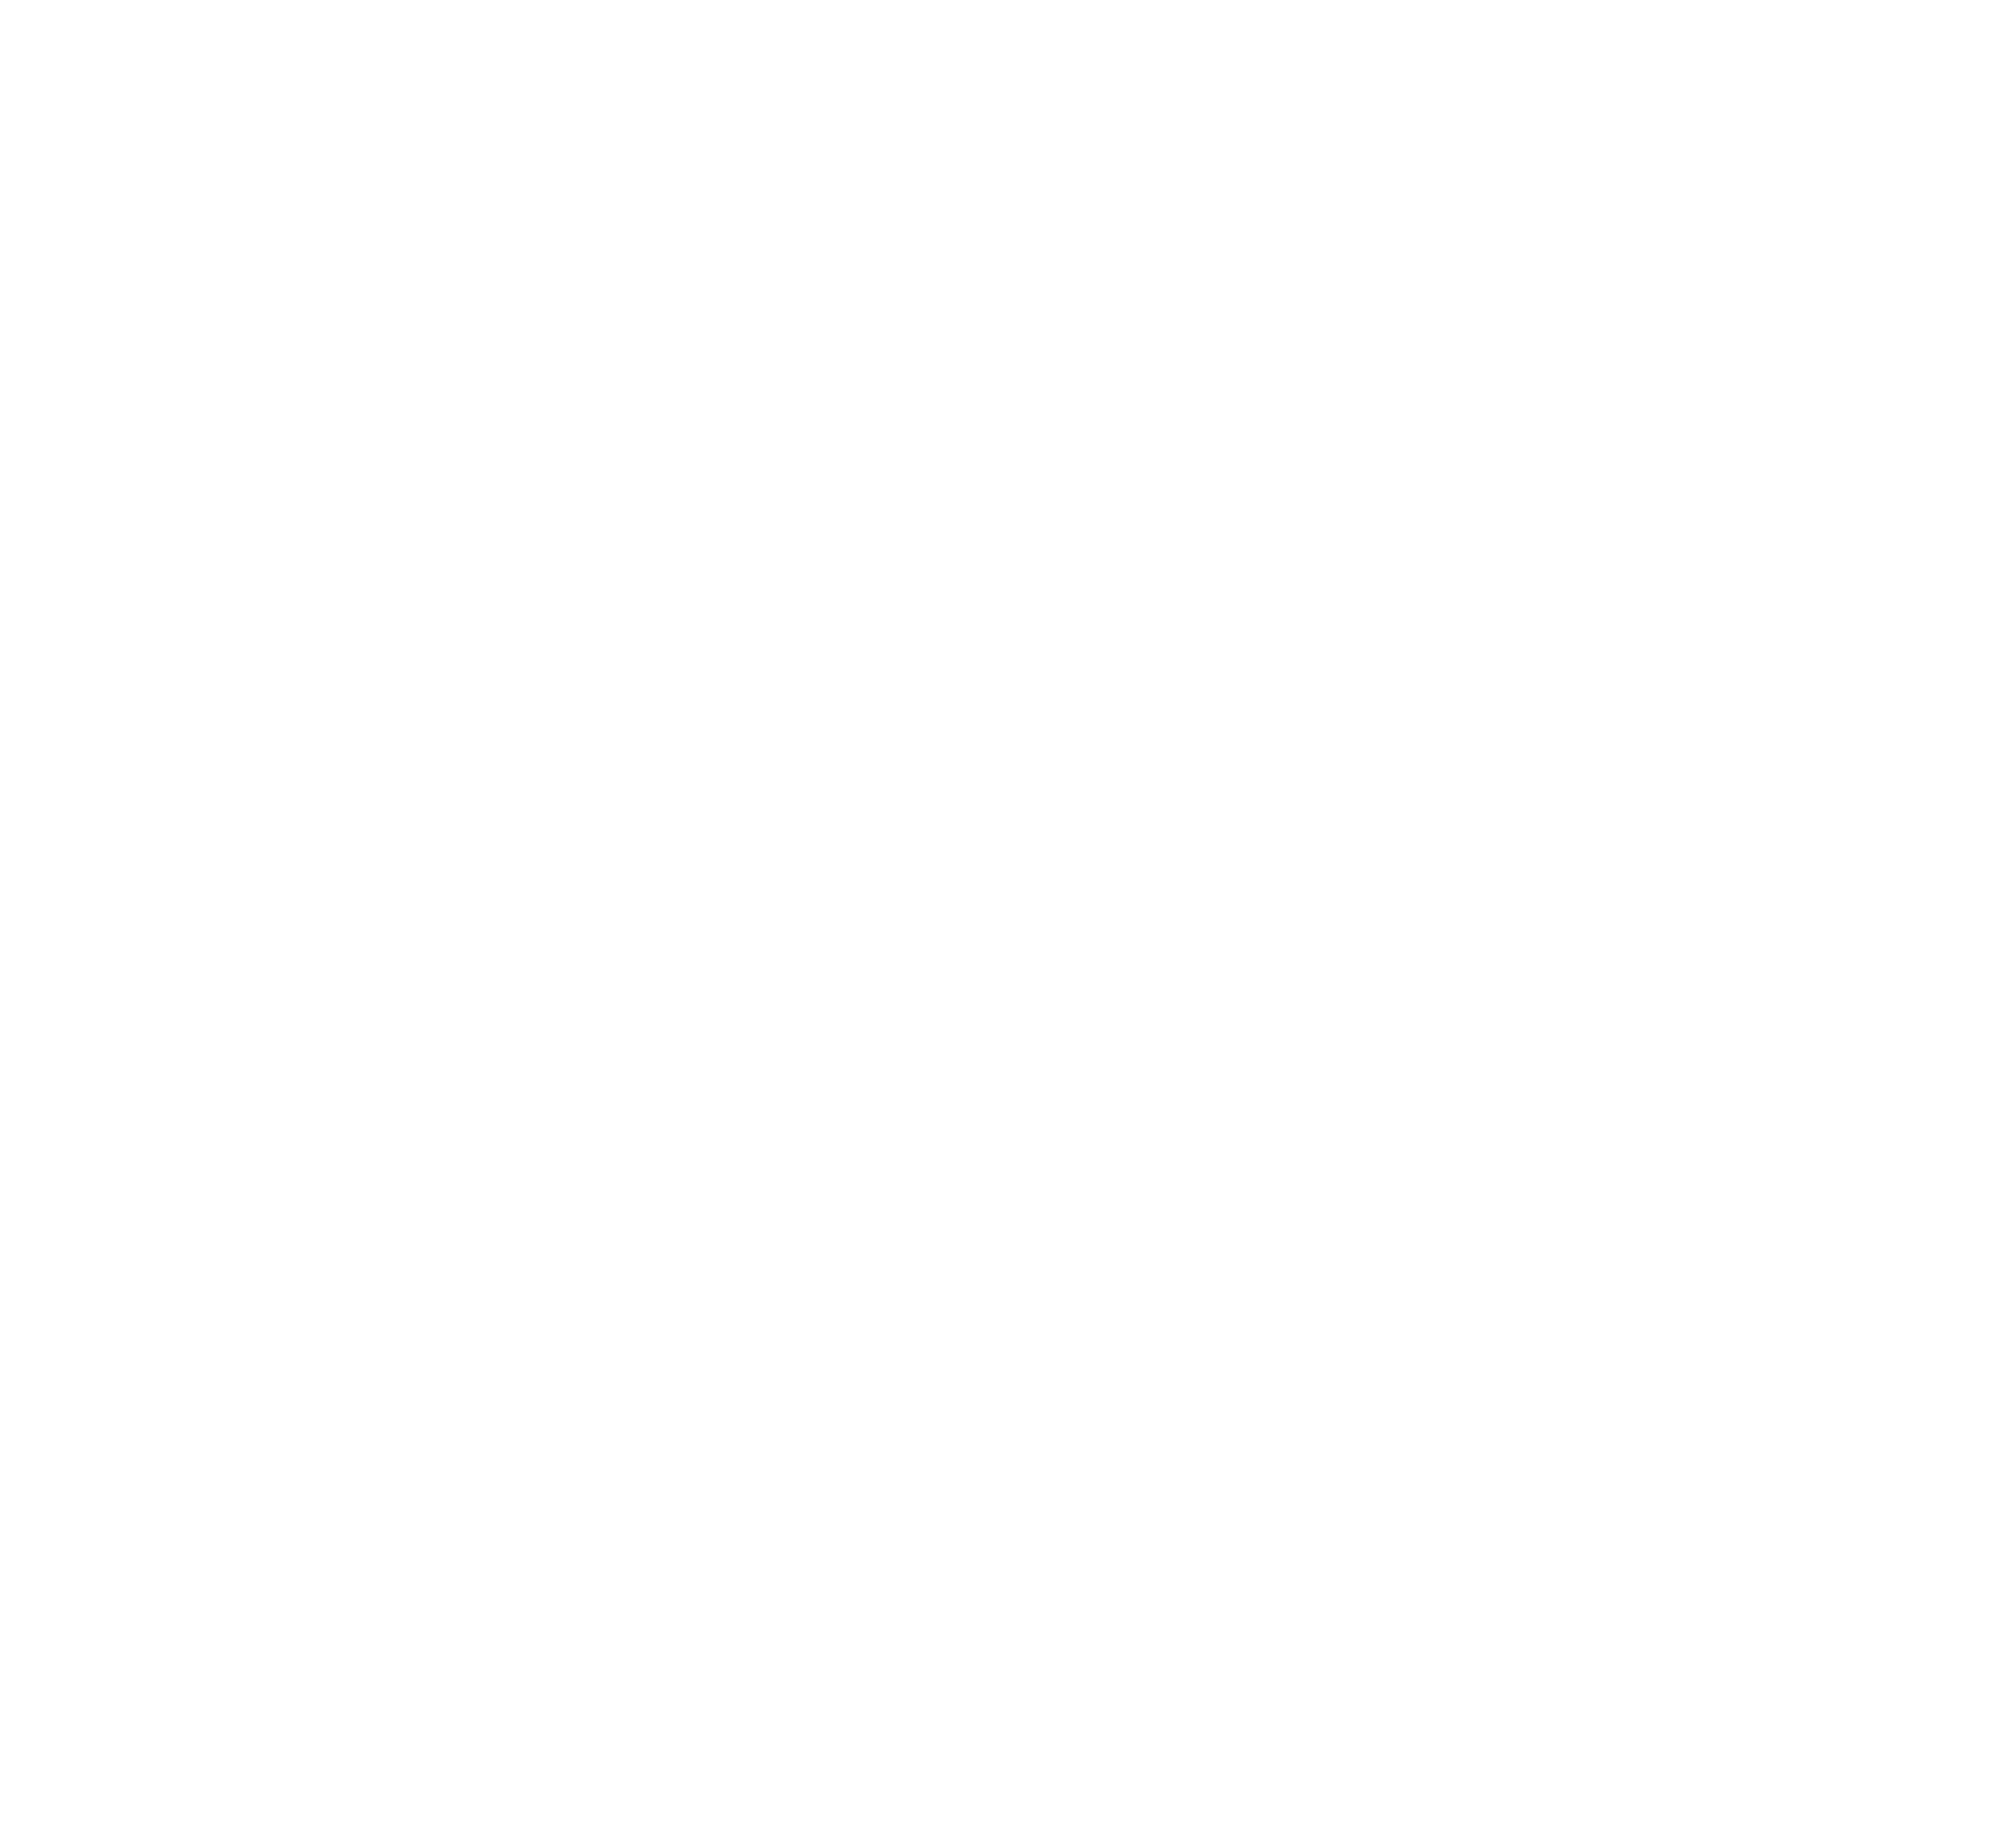 2021-06 Maori text web